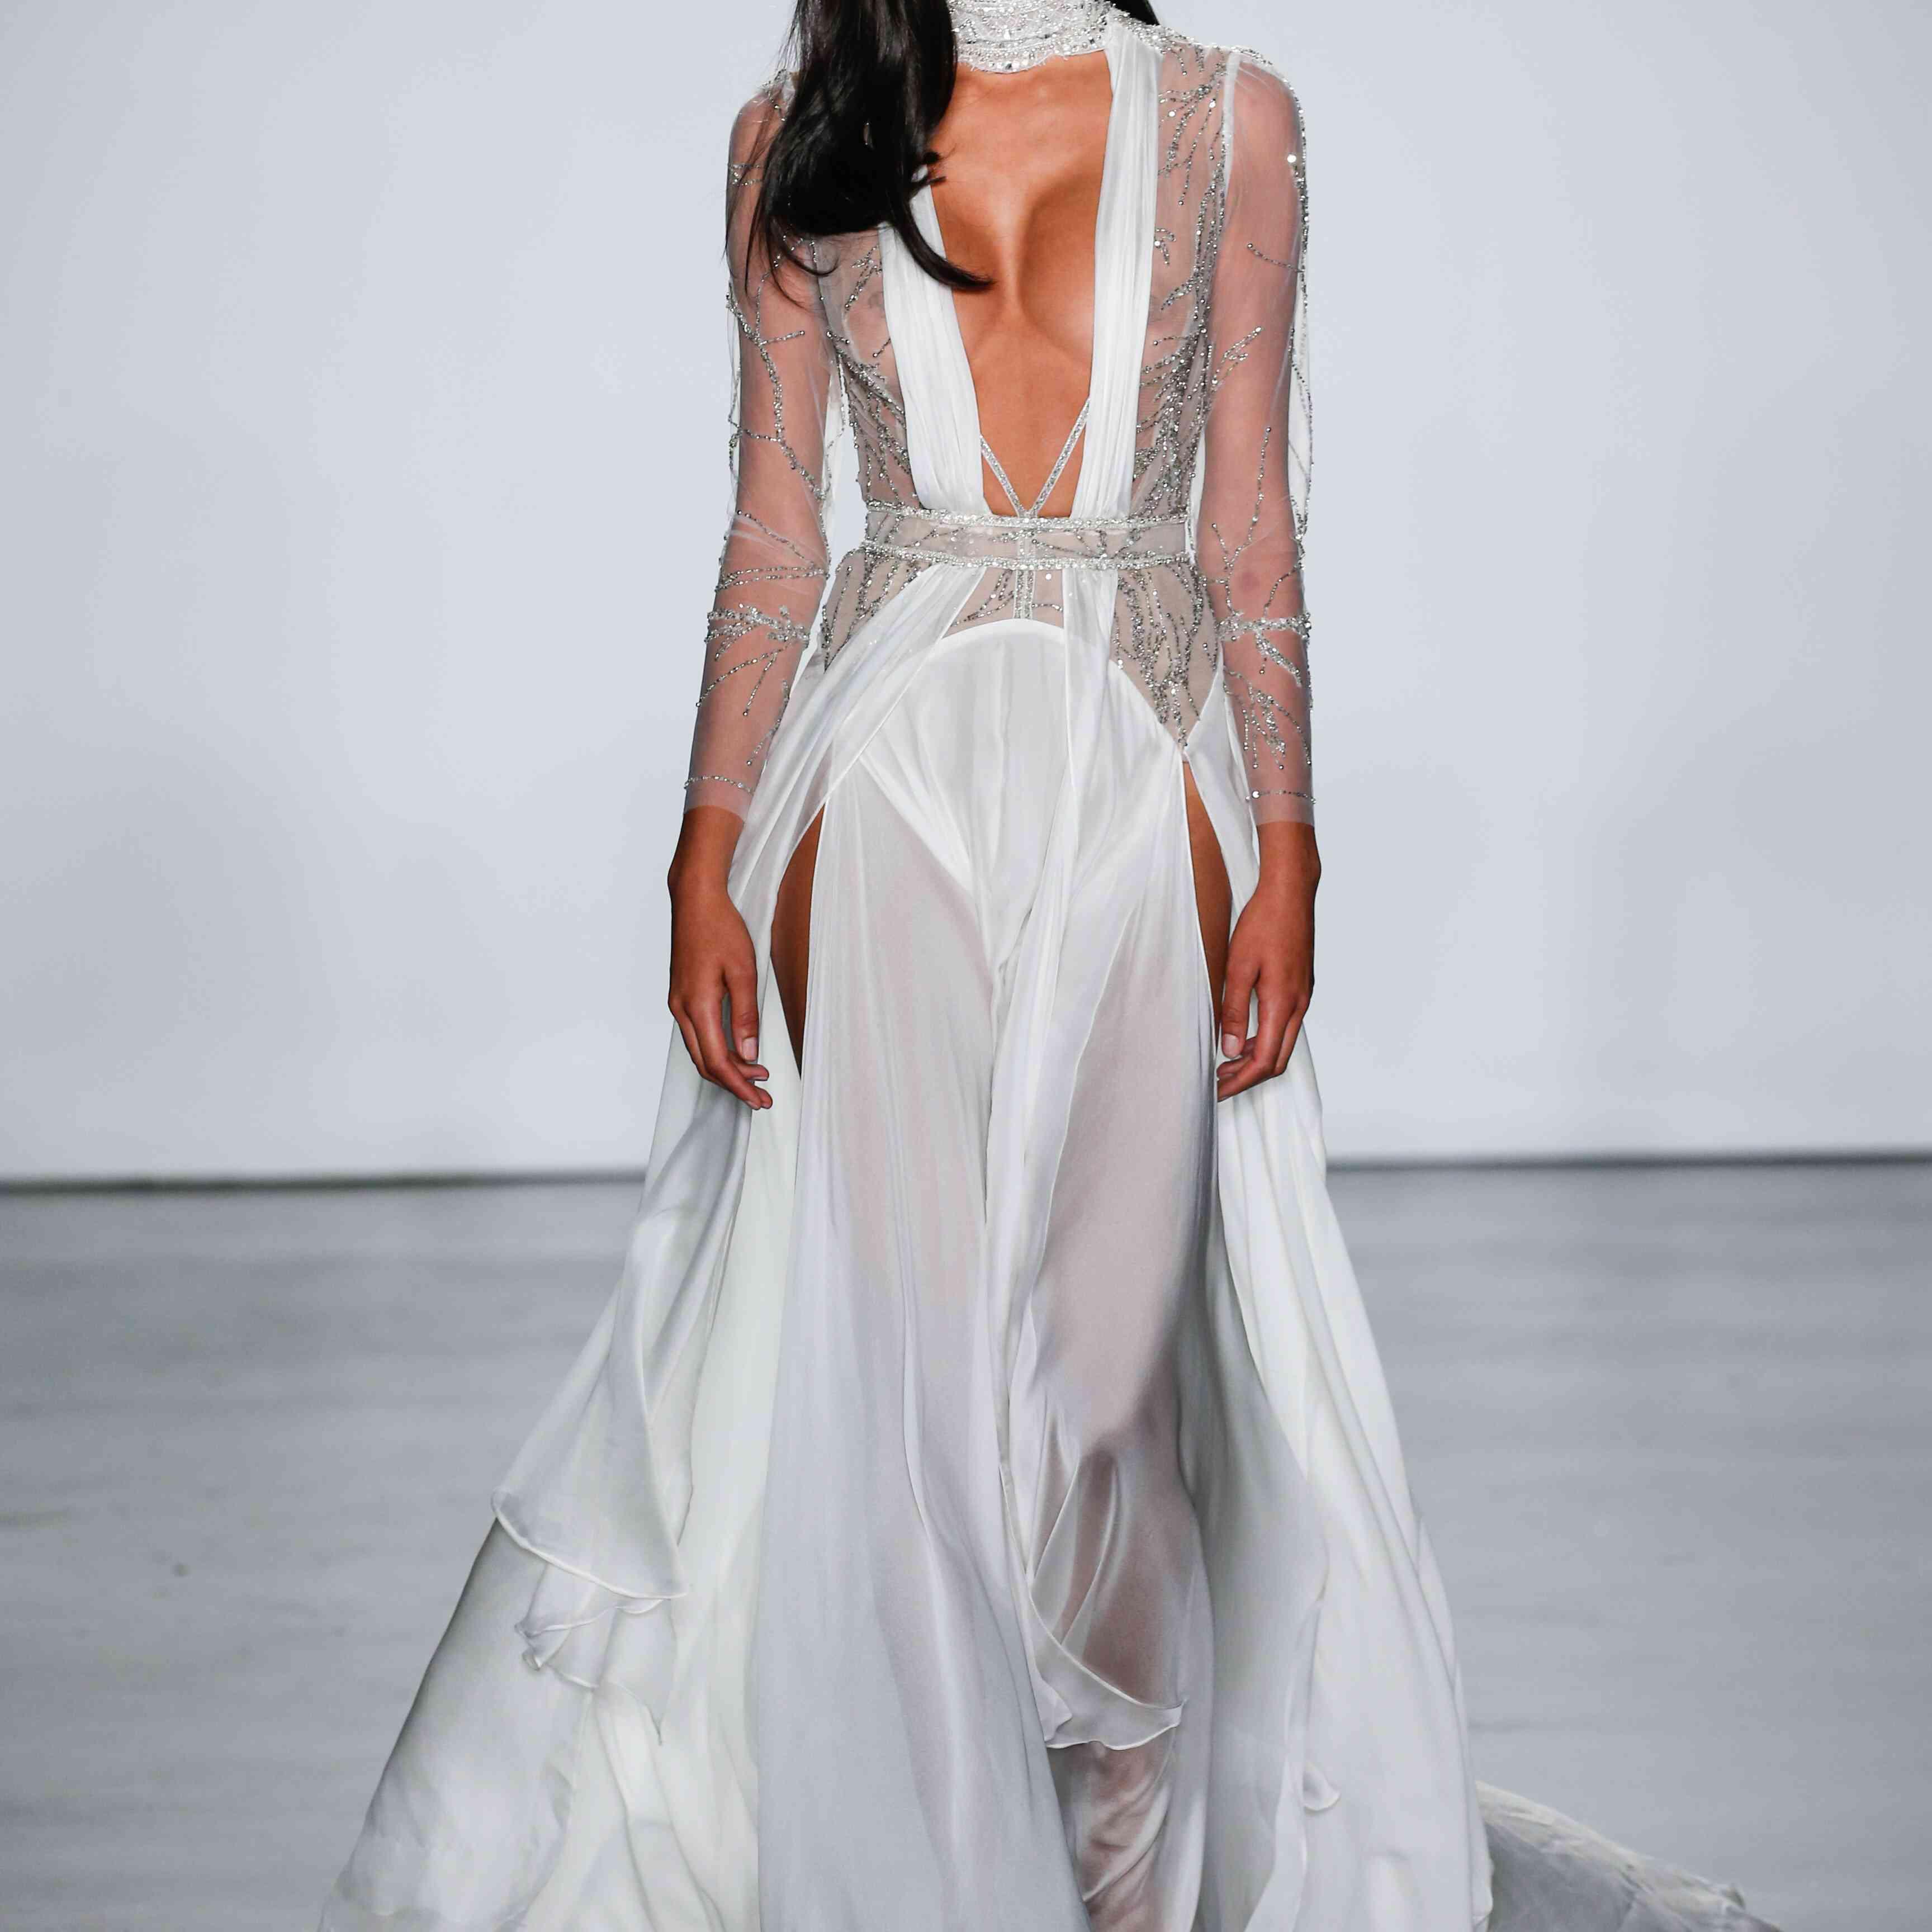 Model in plunging long sleeve wedding dress